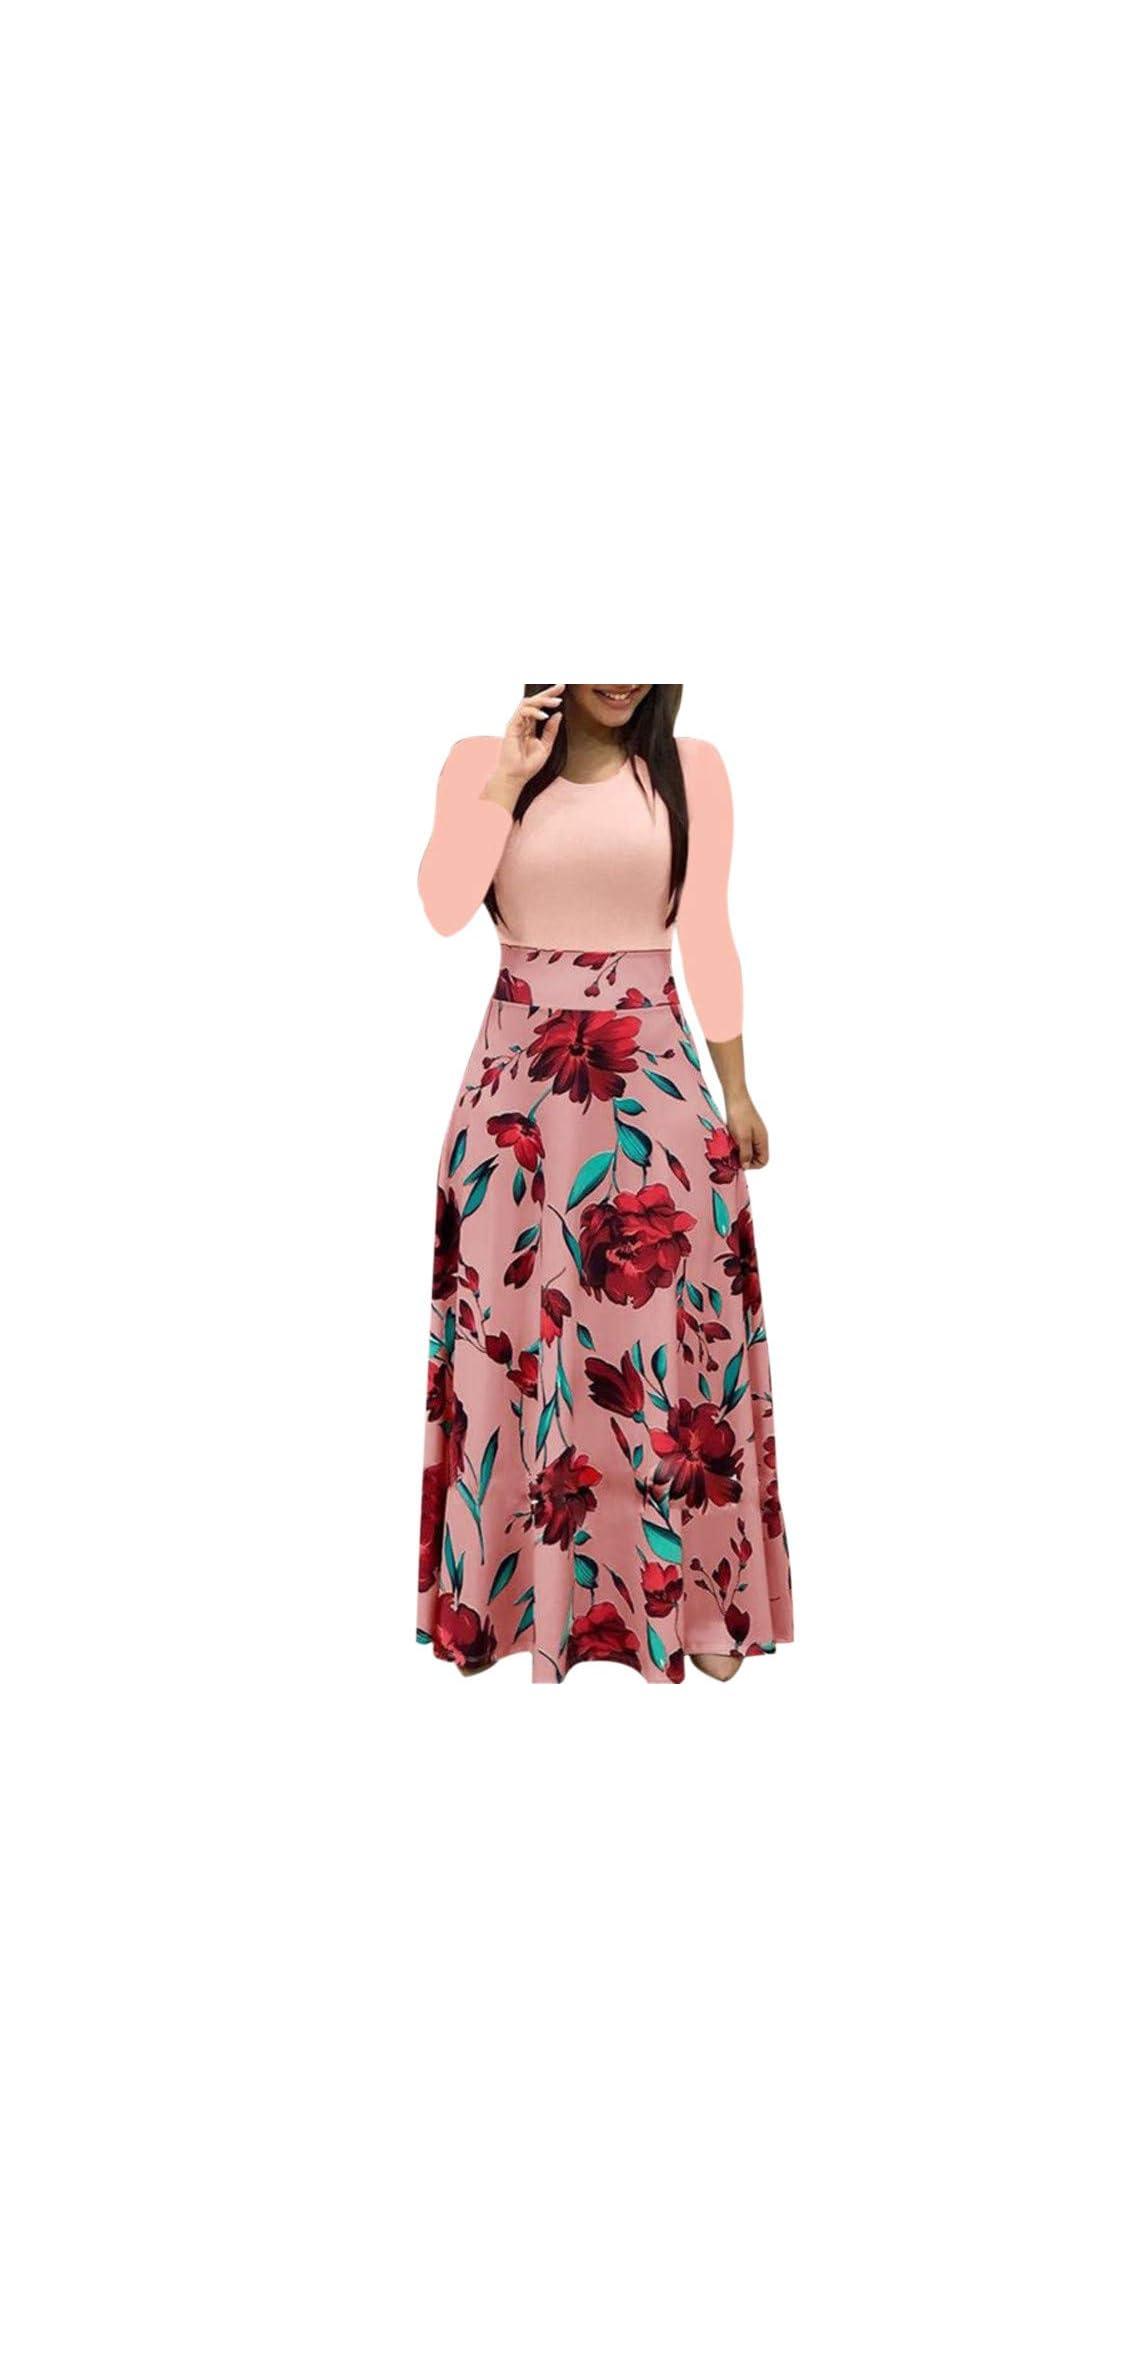 Women's Elegant Dot Bodycon Work Business Party Dress